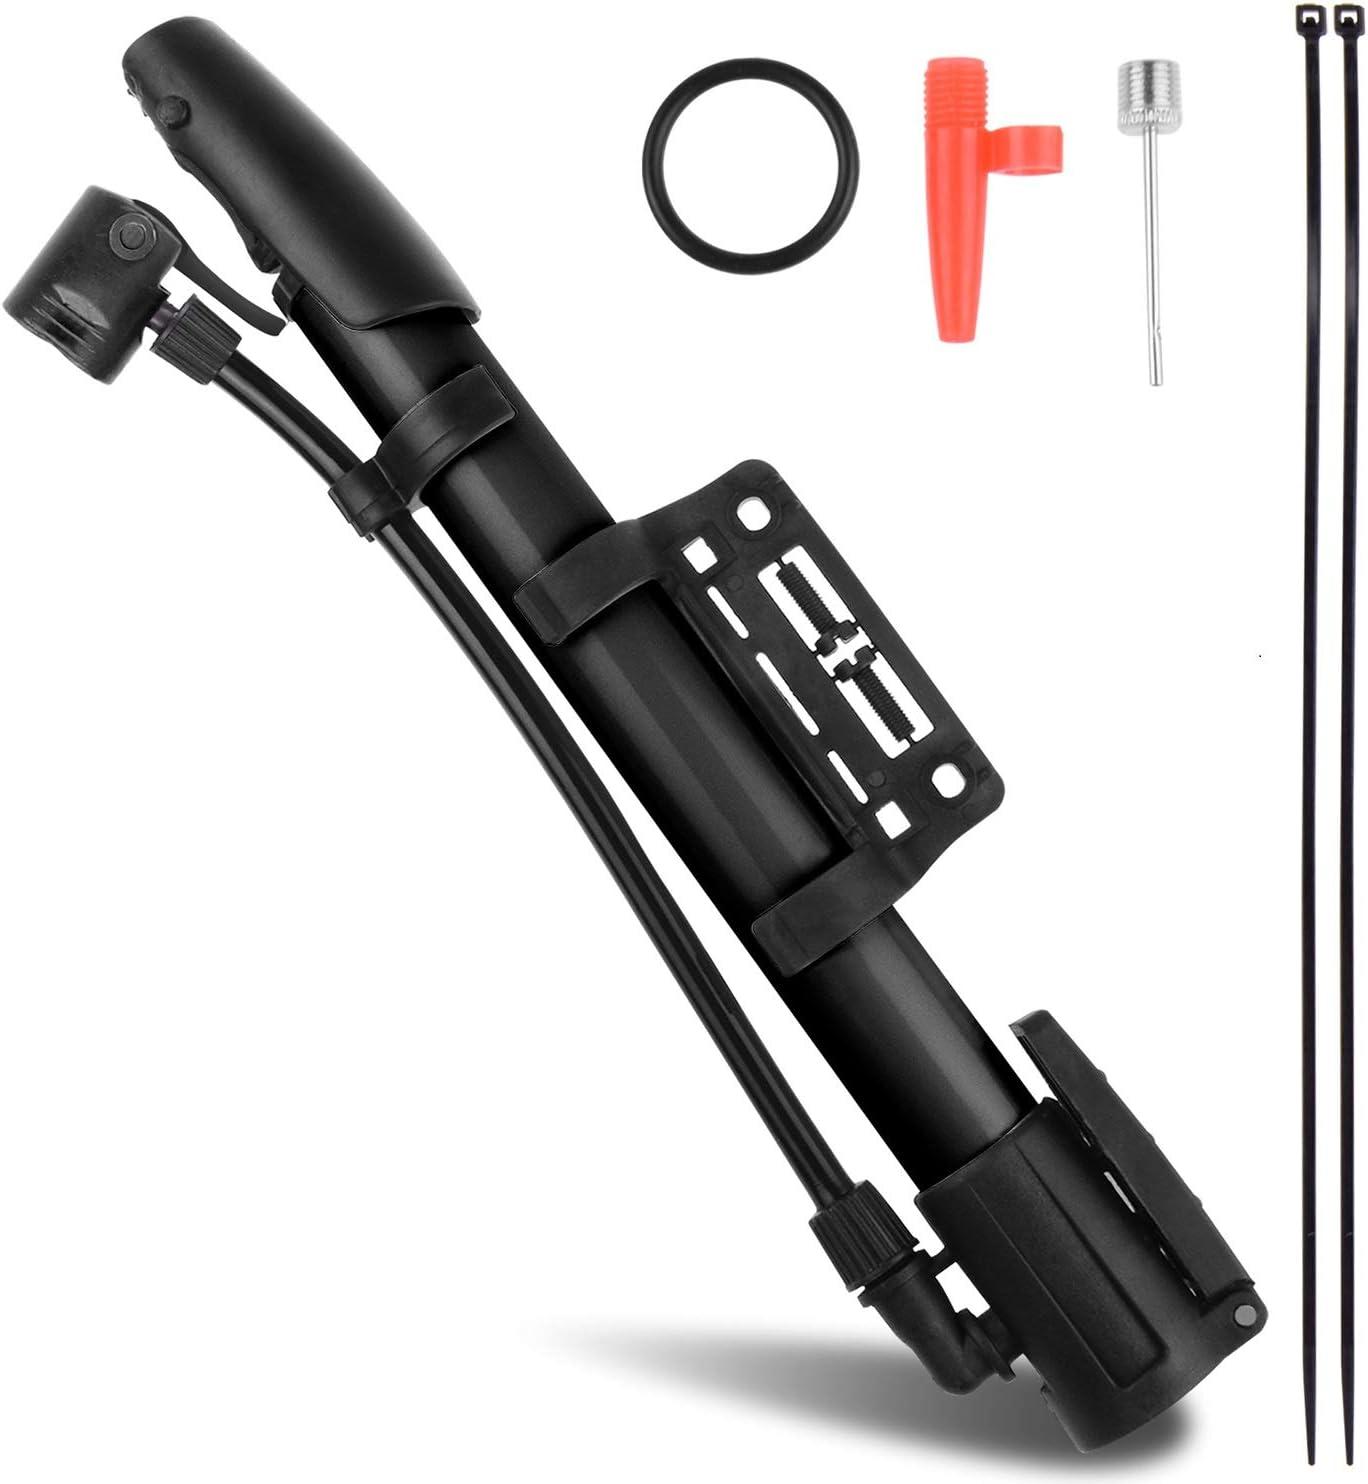 Details about  /Mini Bicycle Pump Bike Air Stick Presta Schrader Aluminum Alloy Tire Inflator